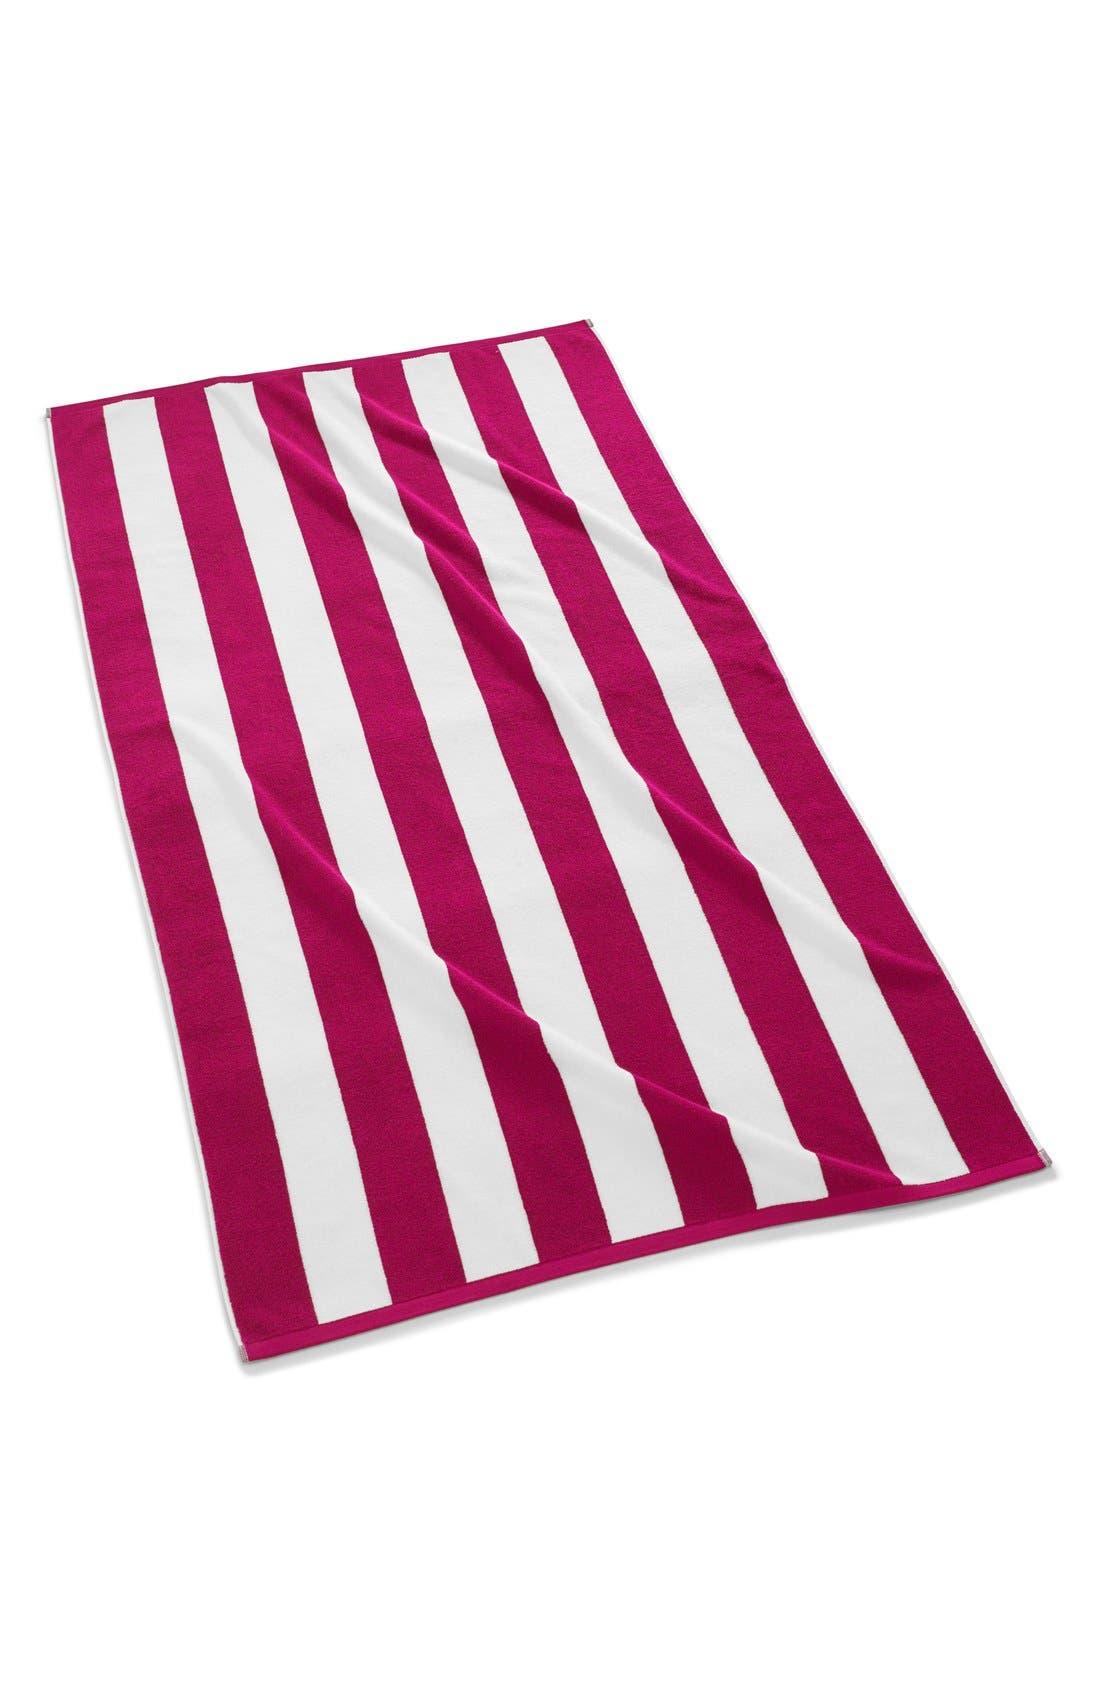 Alternate Image 1 Selected - KASSATEX 'Cabana' Stripe Beach Towel